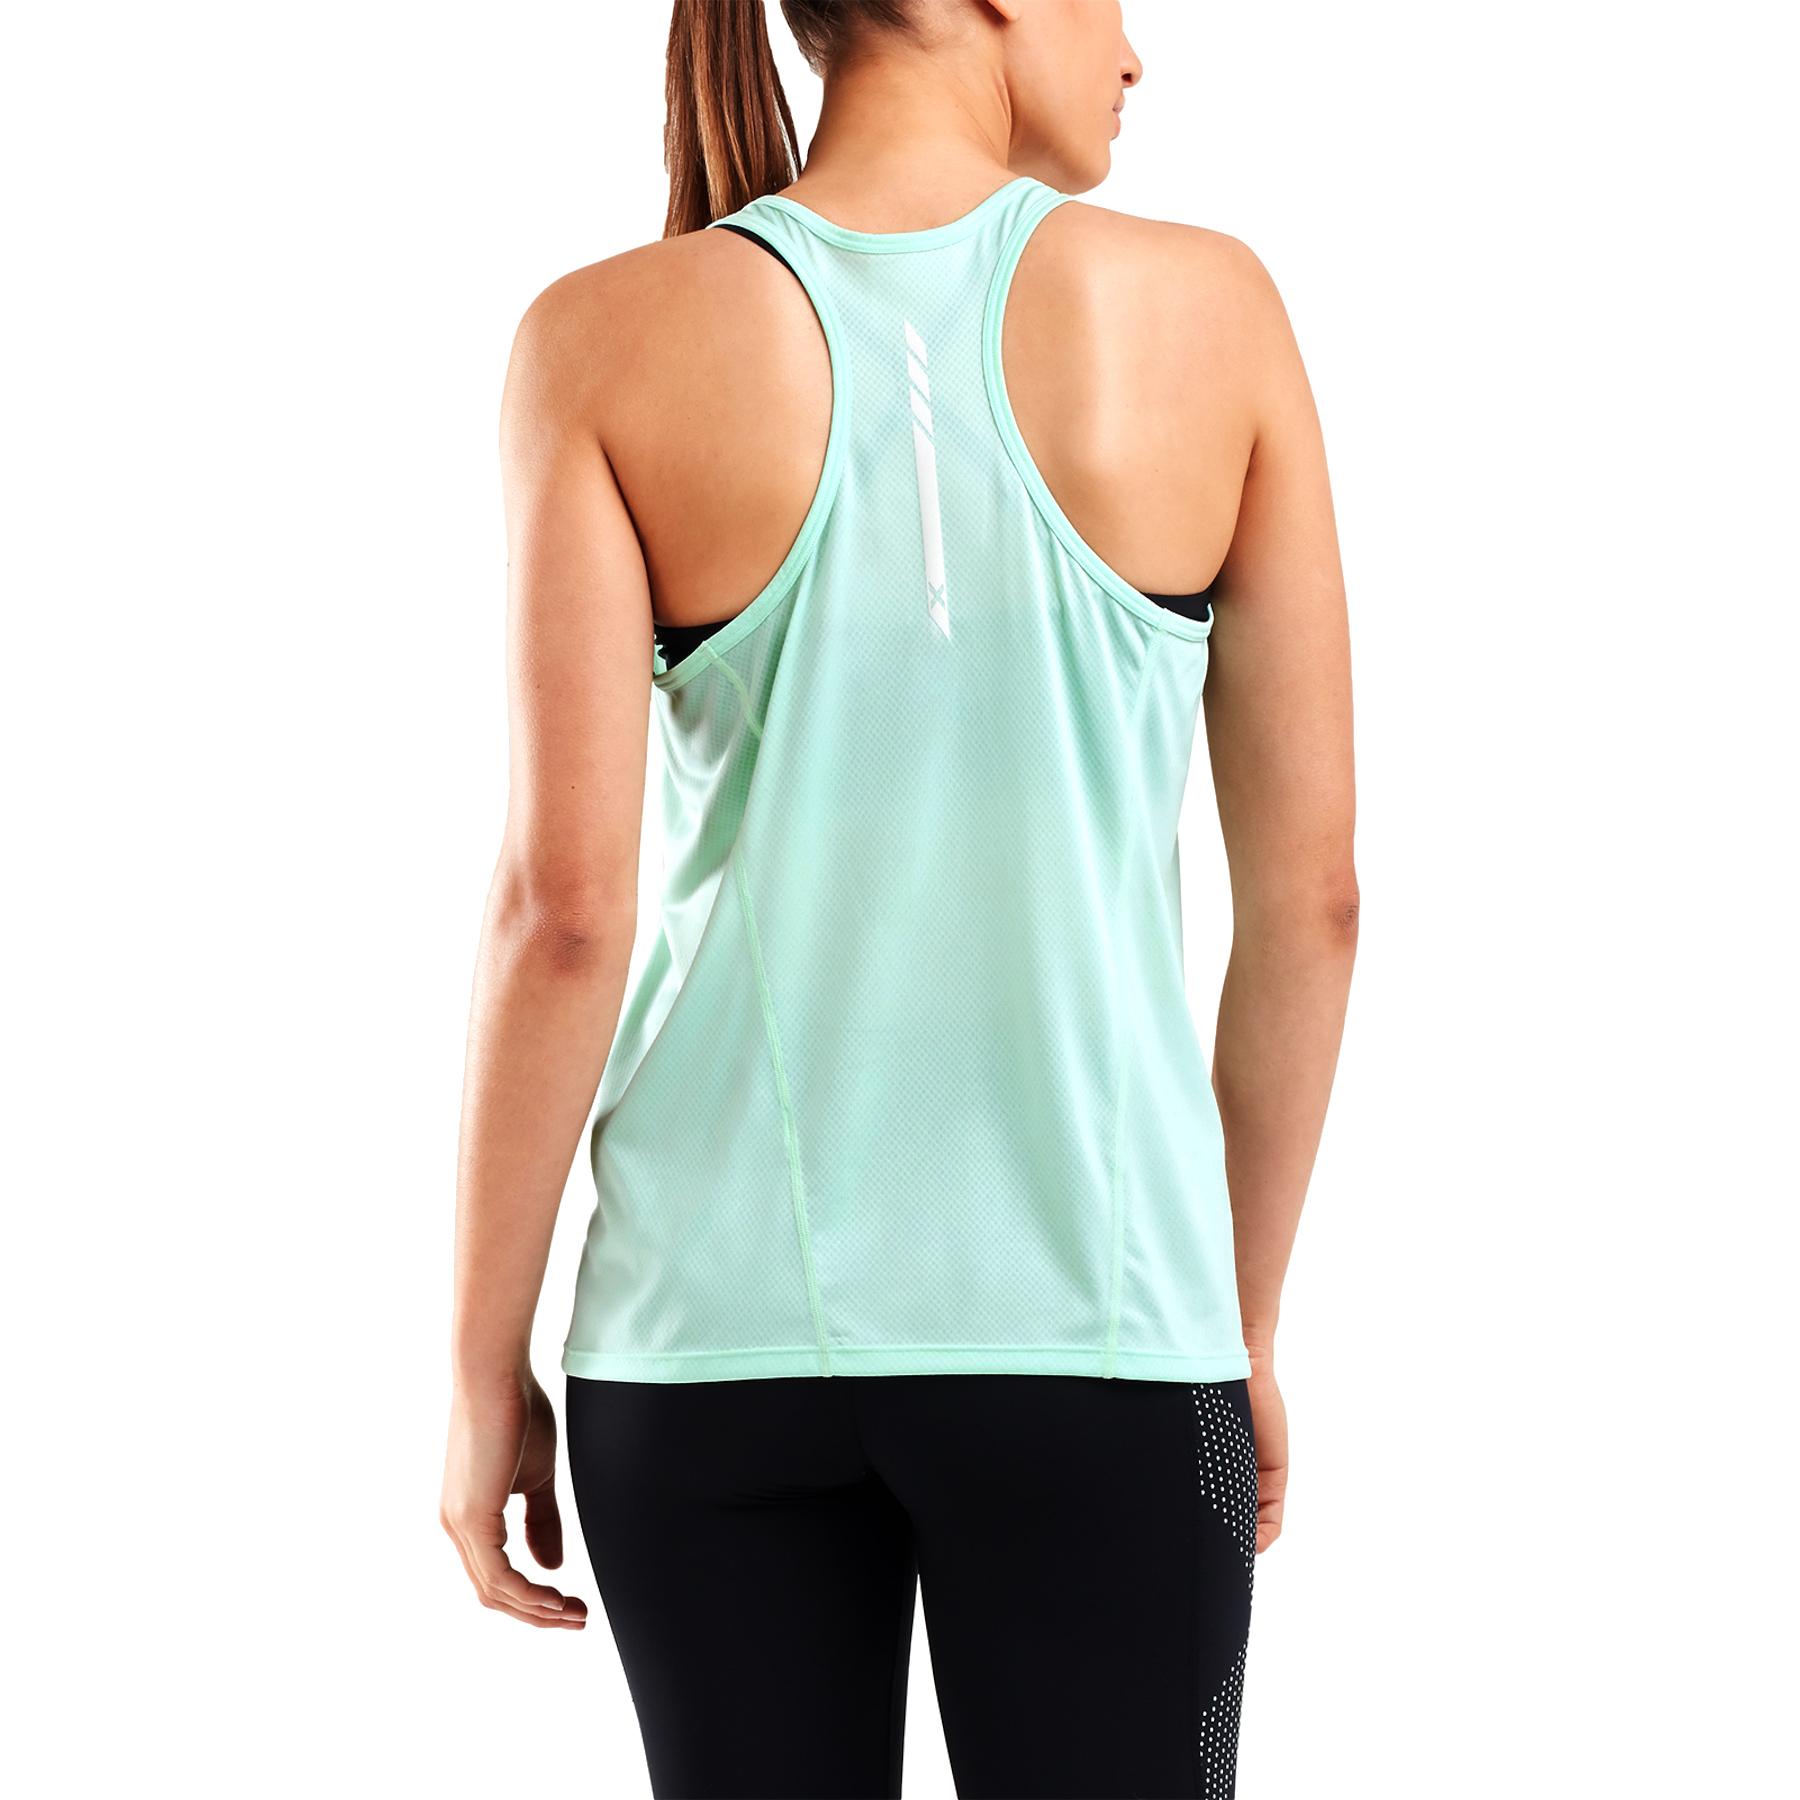 Imagen de 2XU GHST Short Sleeve Women's Singlet - mint/white reflective